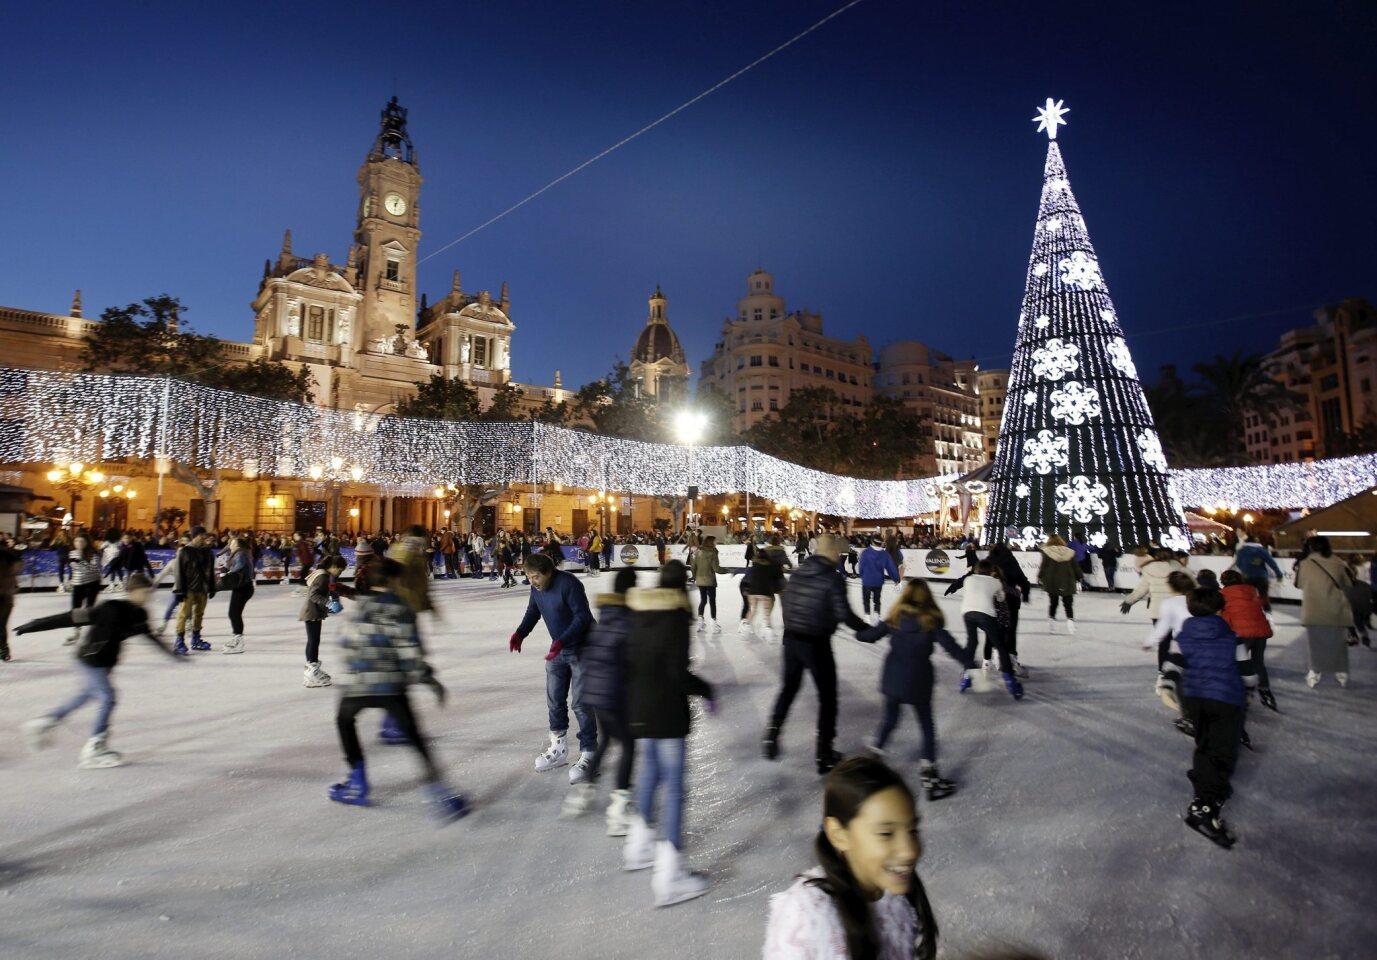 Ice rink in Valencia, Spain